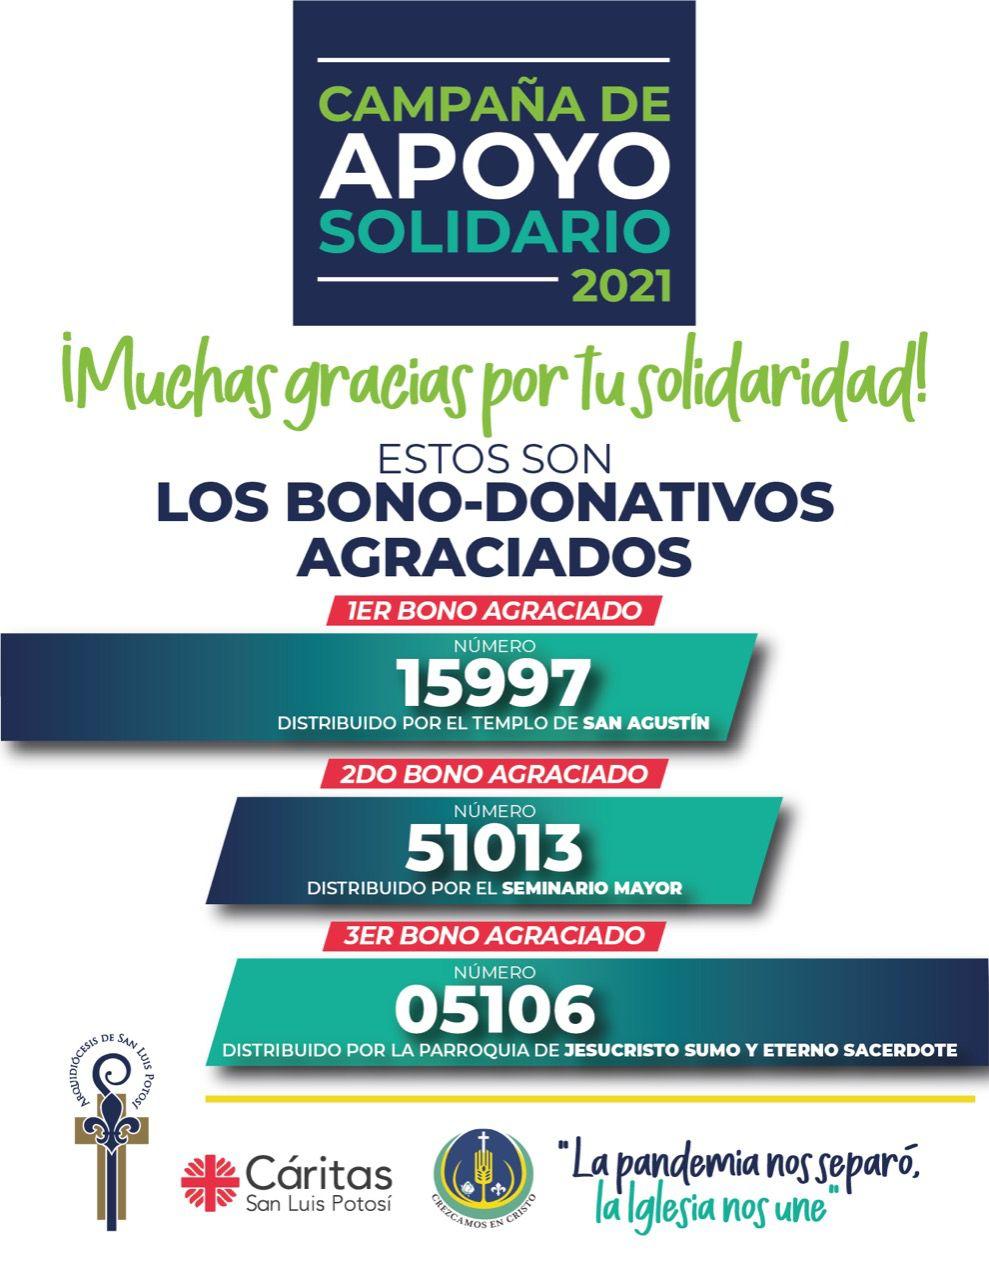 Campaña Apoyo Solidario 2021